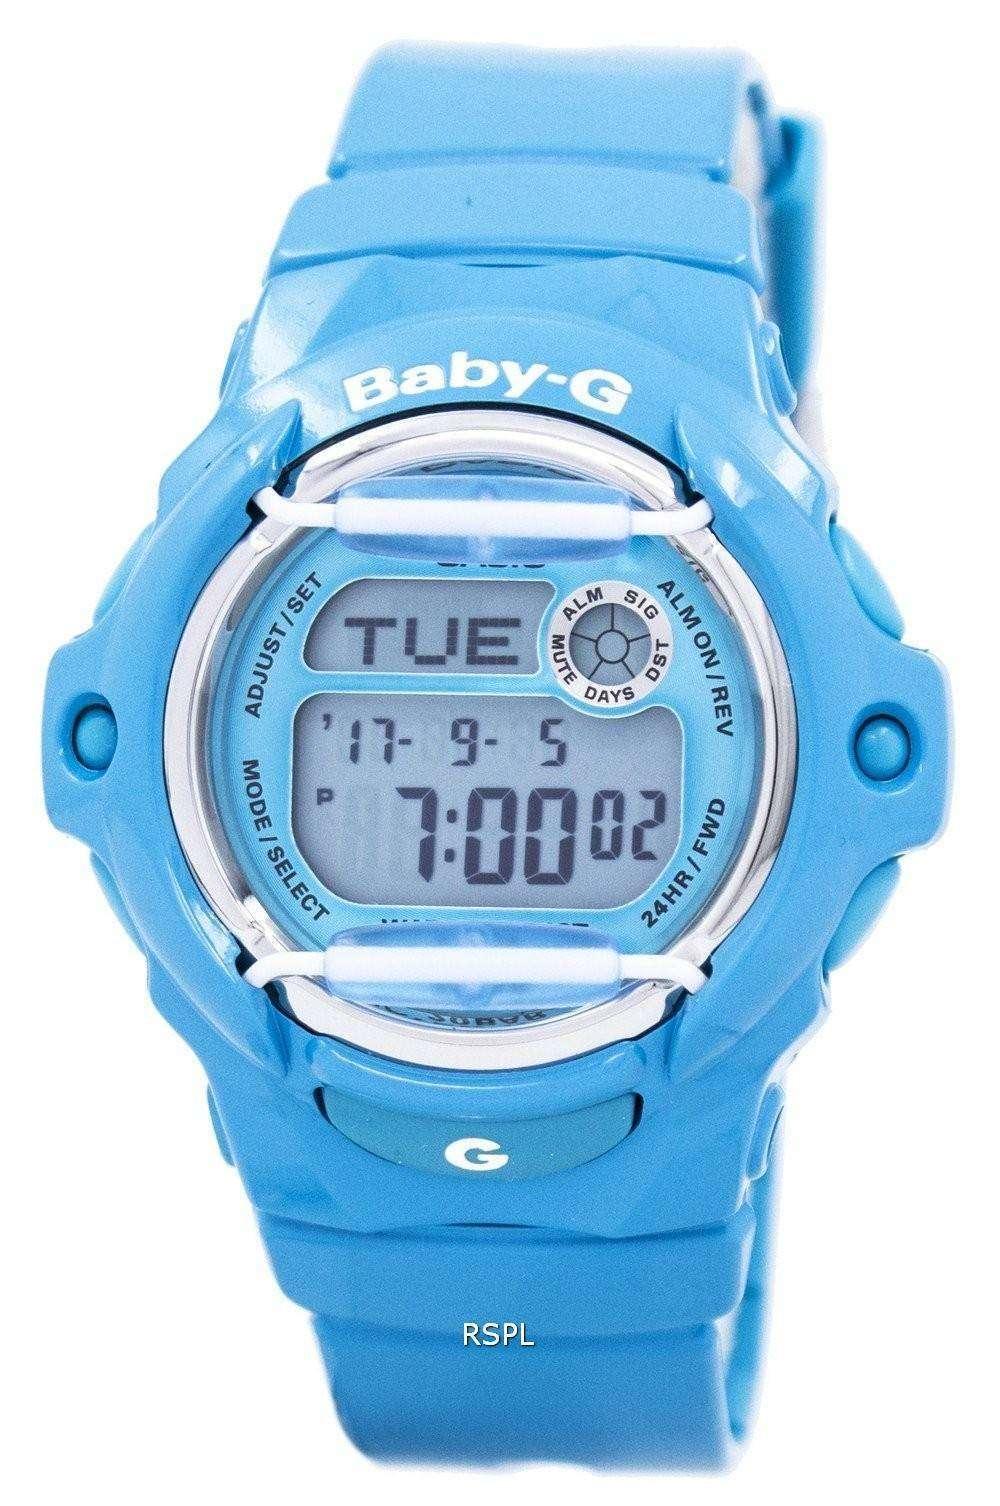 ce461e3b50d1 Casio Baby-g BG-169R-2B BG-169R BG-169R-2 mujeres reloj - citywatches.es